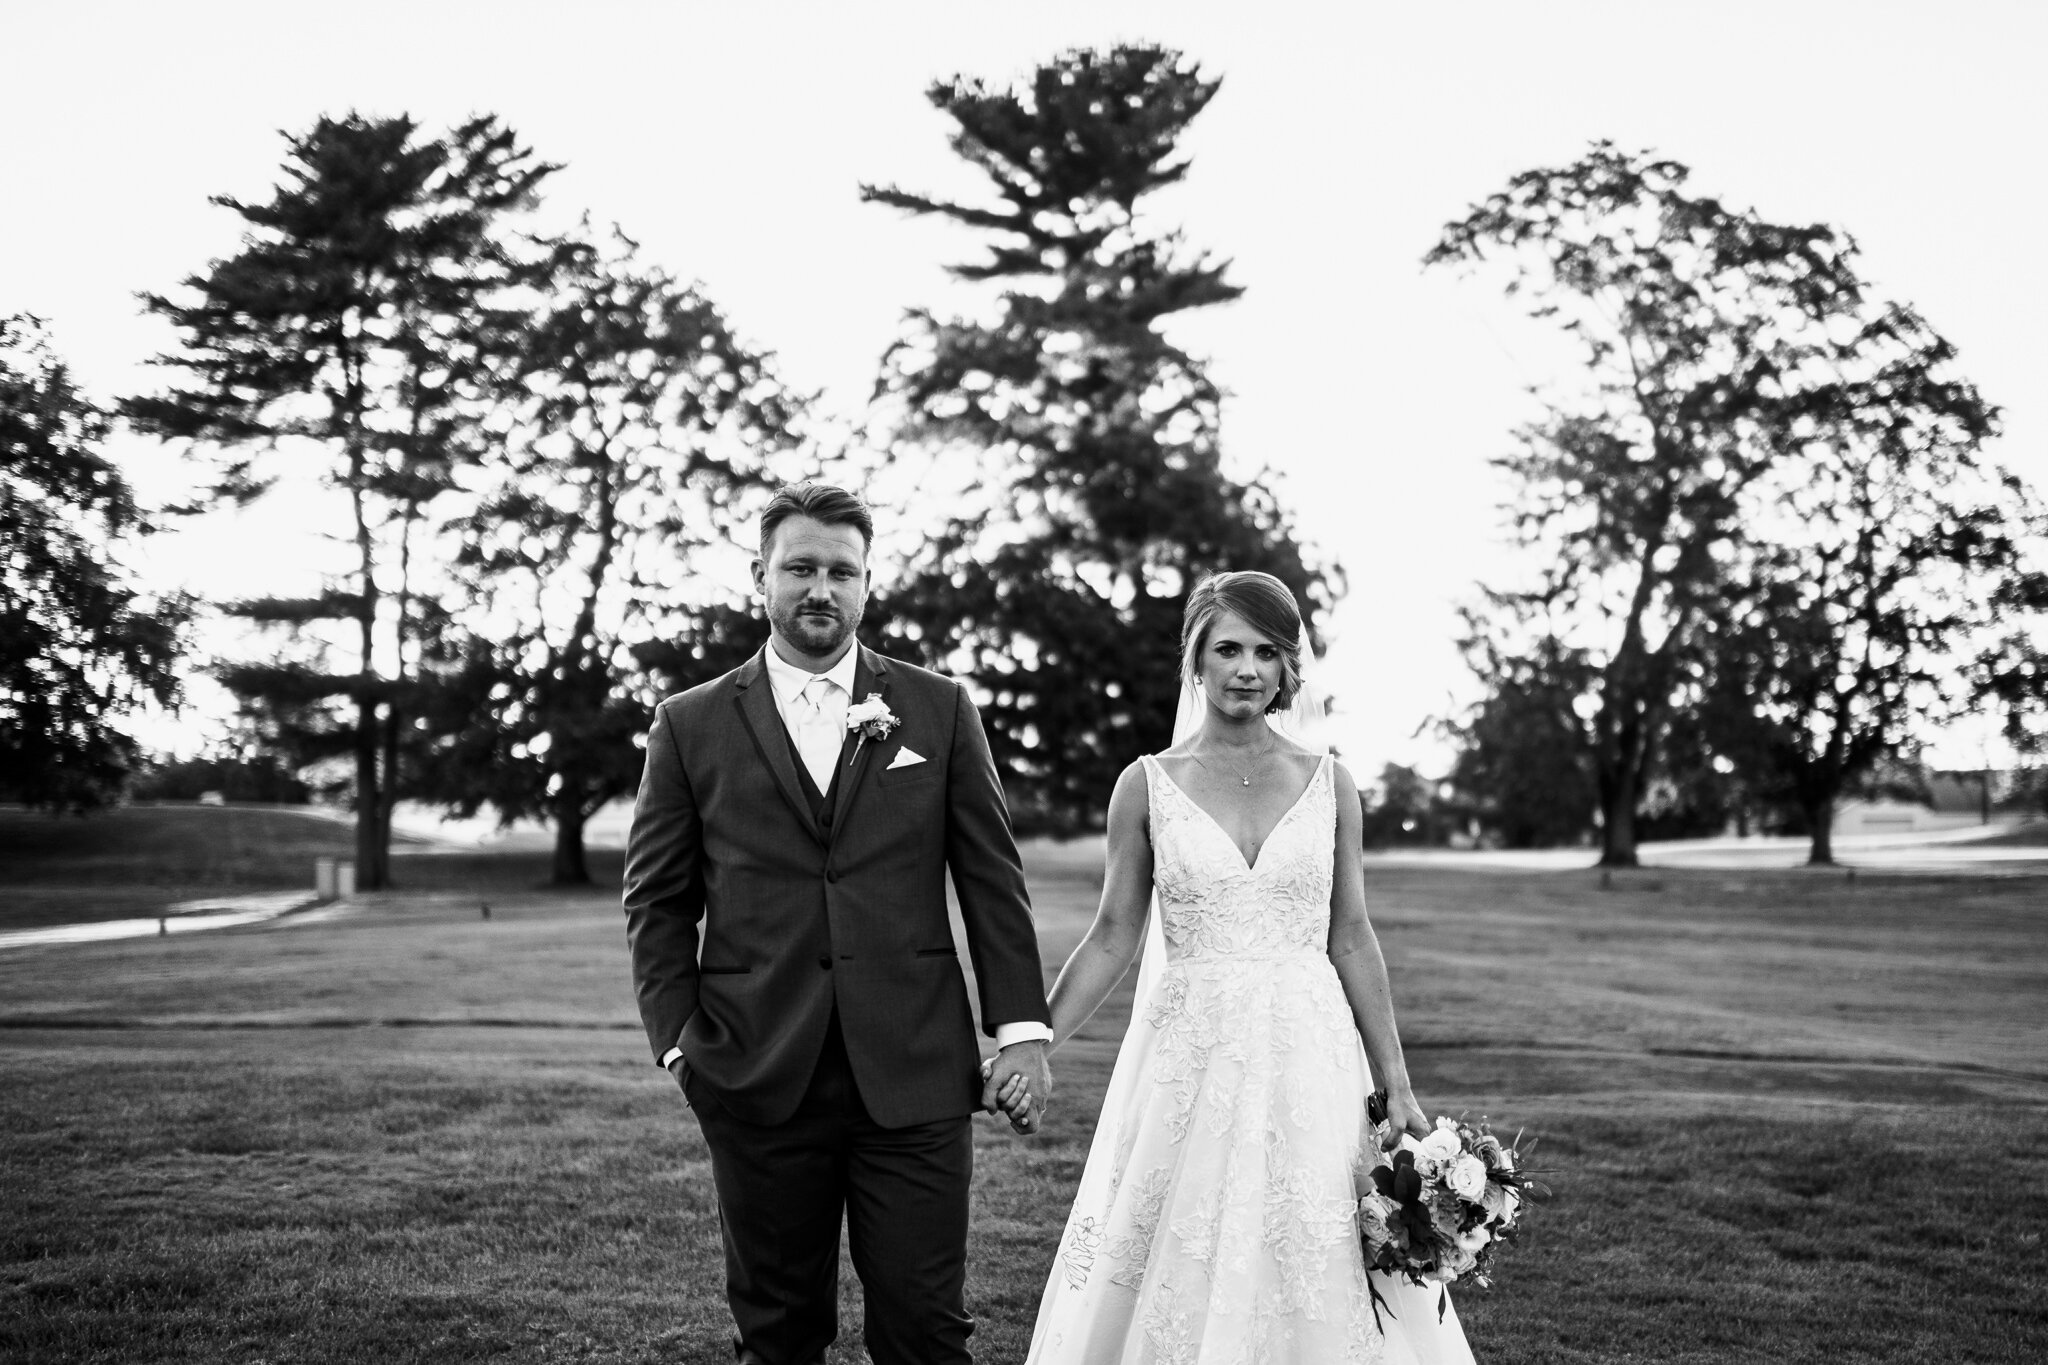 Coyle-Forsgate-Country-Club-Wedding-Photographer-24.JPG